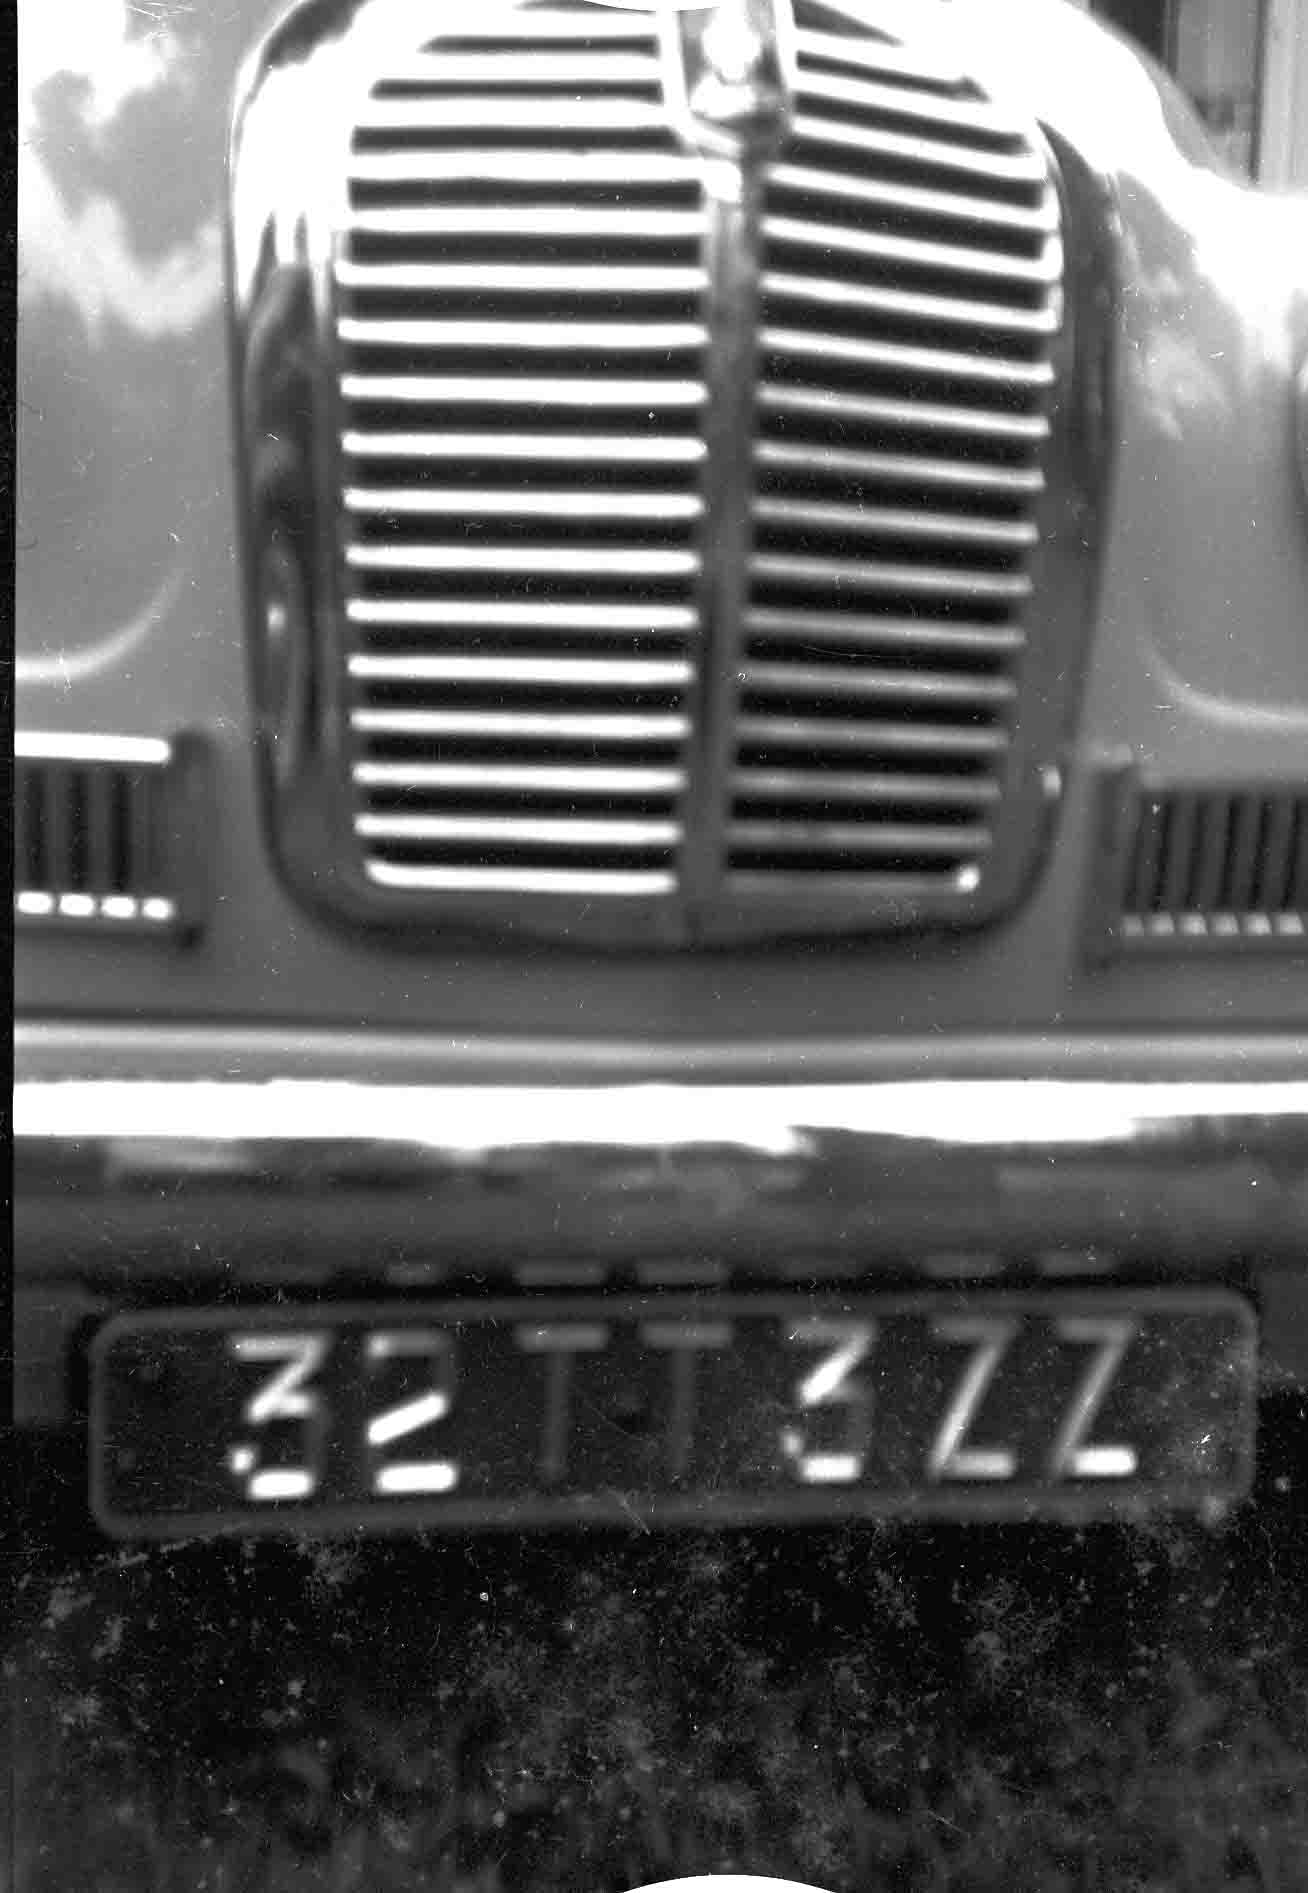 (DZ)(timp 51-54,53-F).Algeria_32 TT 3ZZ f_negs_AustinA40.jfvbKS